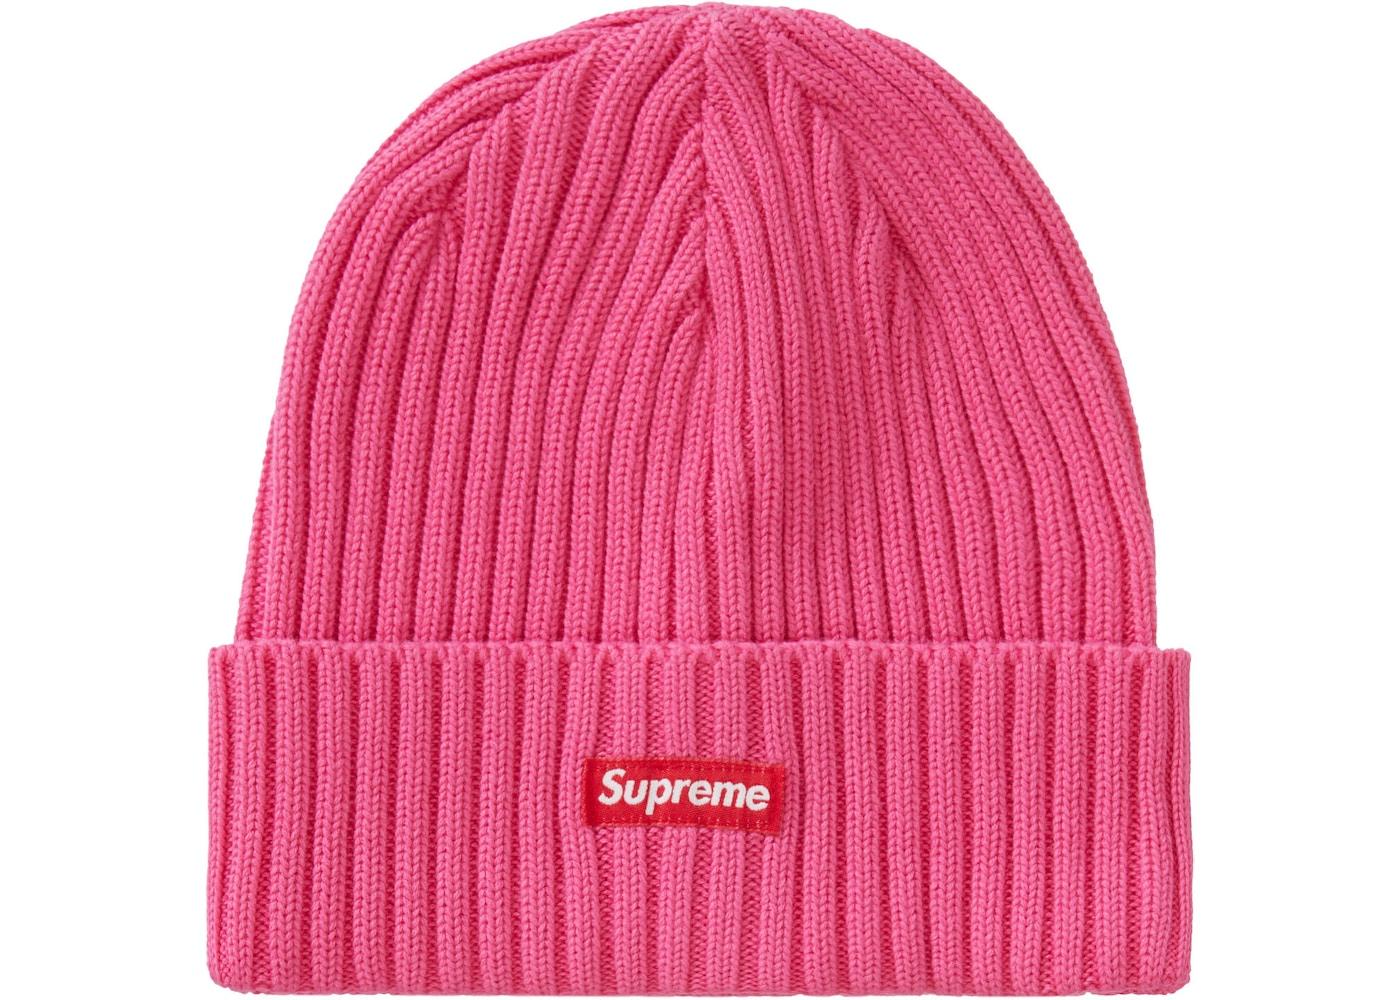 Supreme Overdyed Beanie Pink Tie Dye